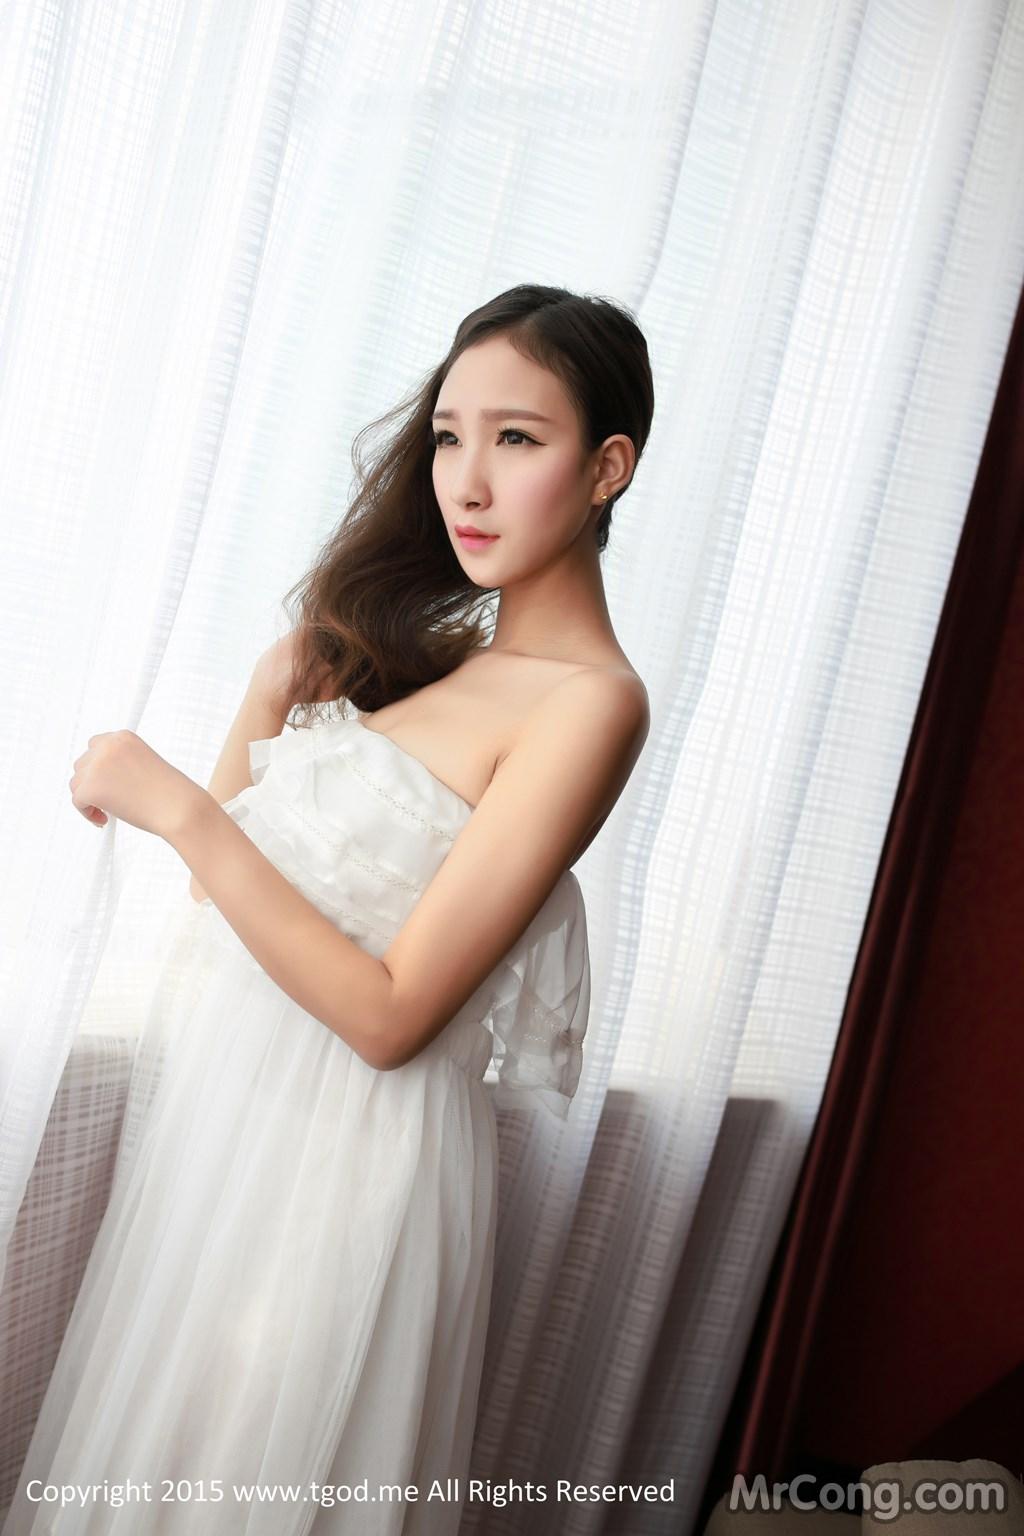 TGOD 2015-02-02: Model Xiao Tong (晓彤) (51P)